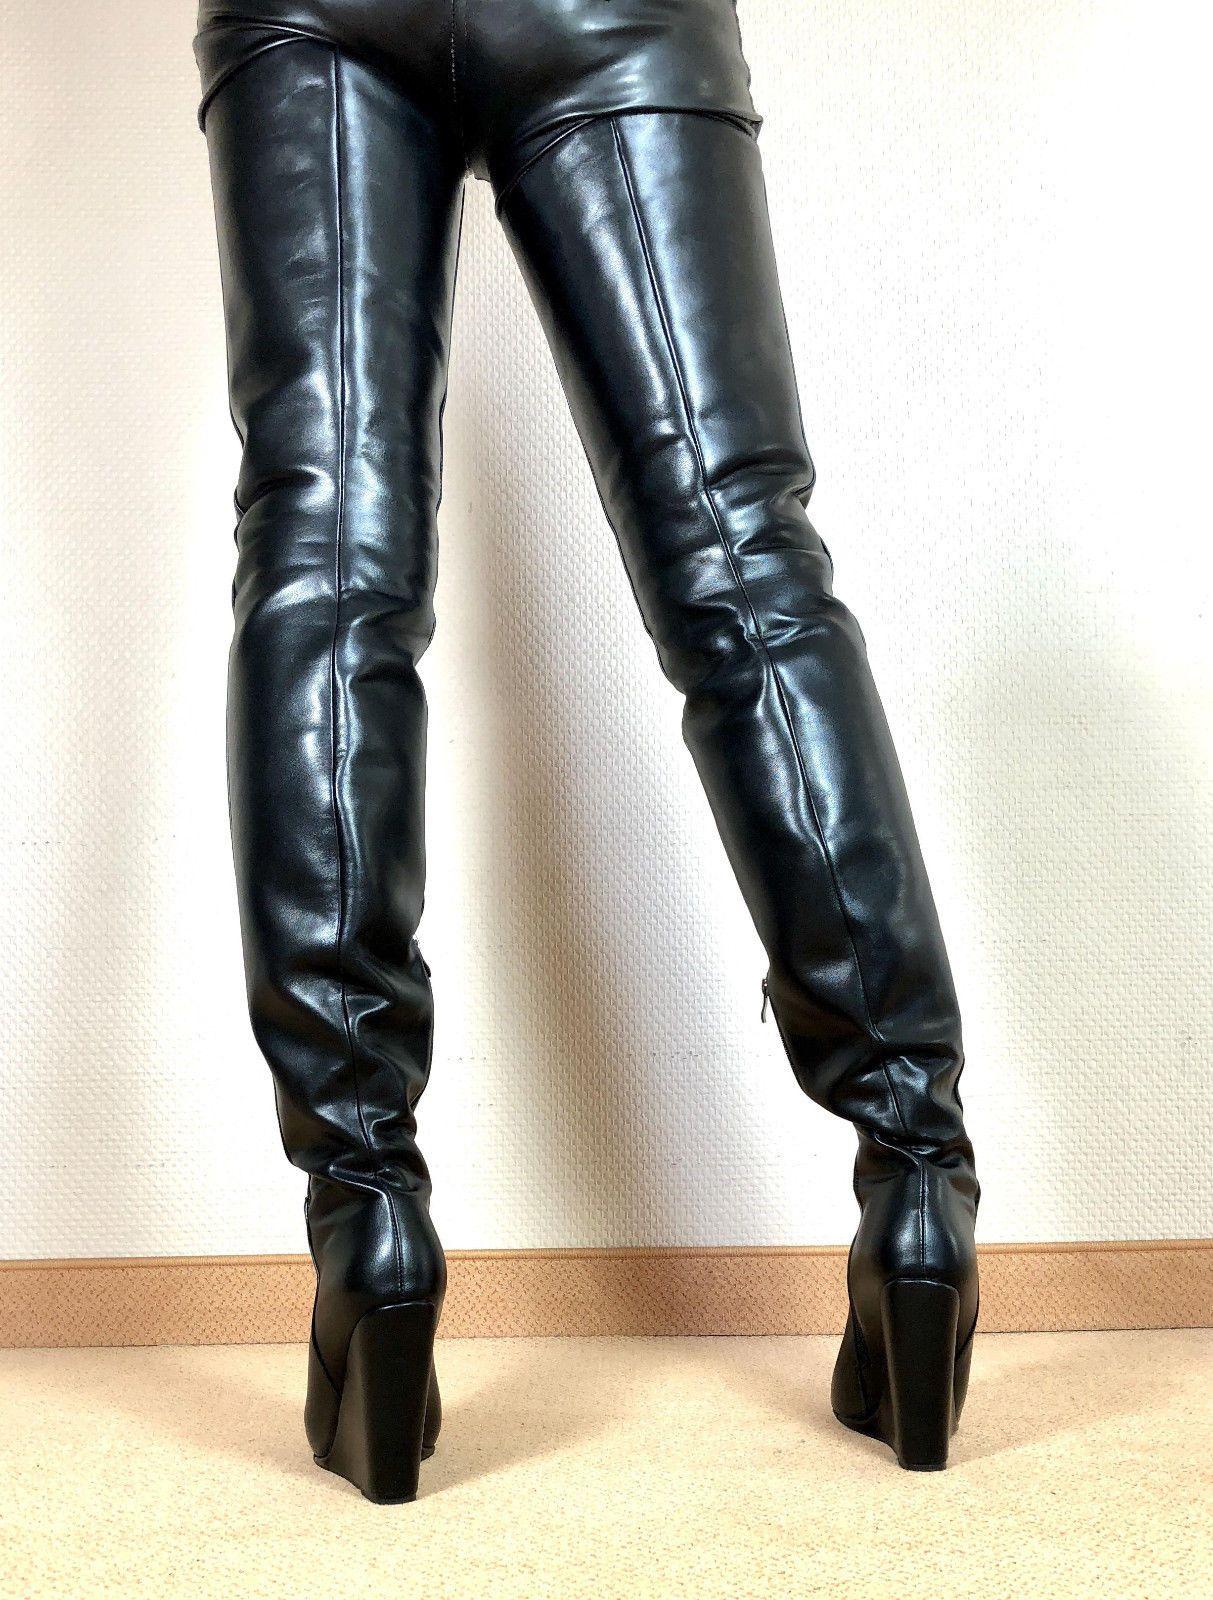 a71836ab012c0 Gr.46 TOP ! Exklusiv Sexy Damen Schuhe Overknee Wedges Stiefel ...